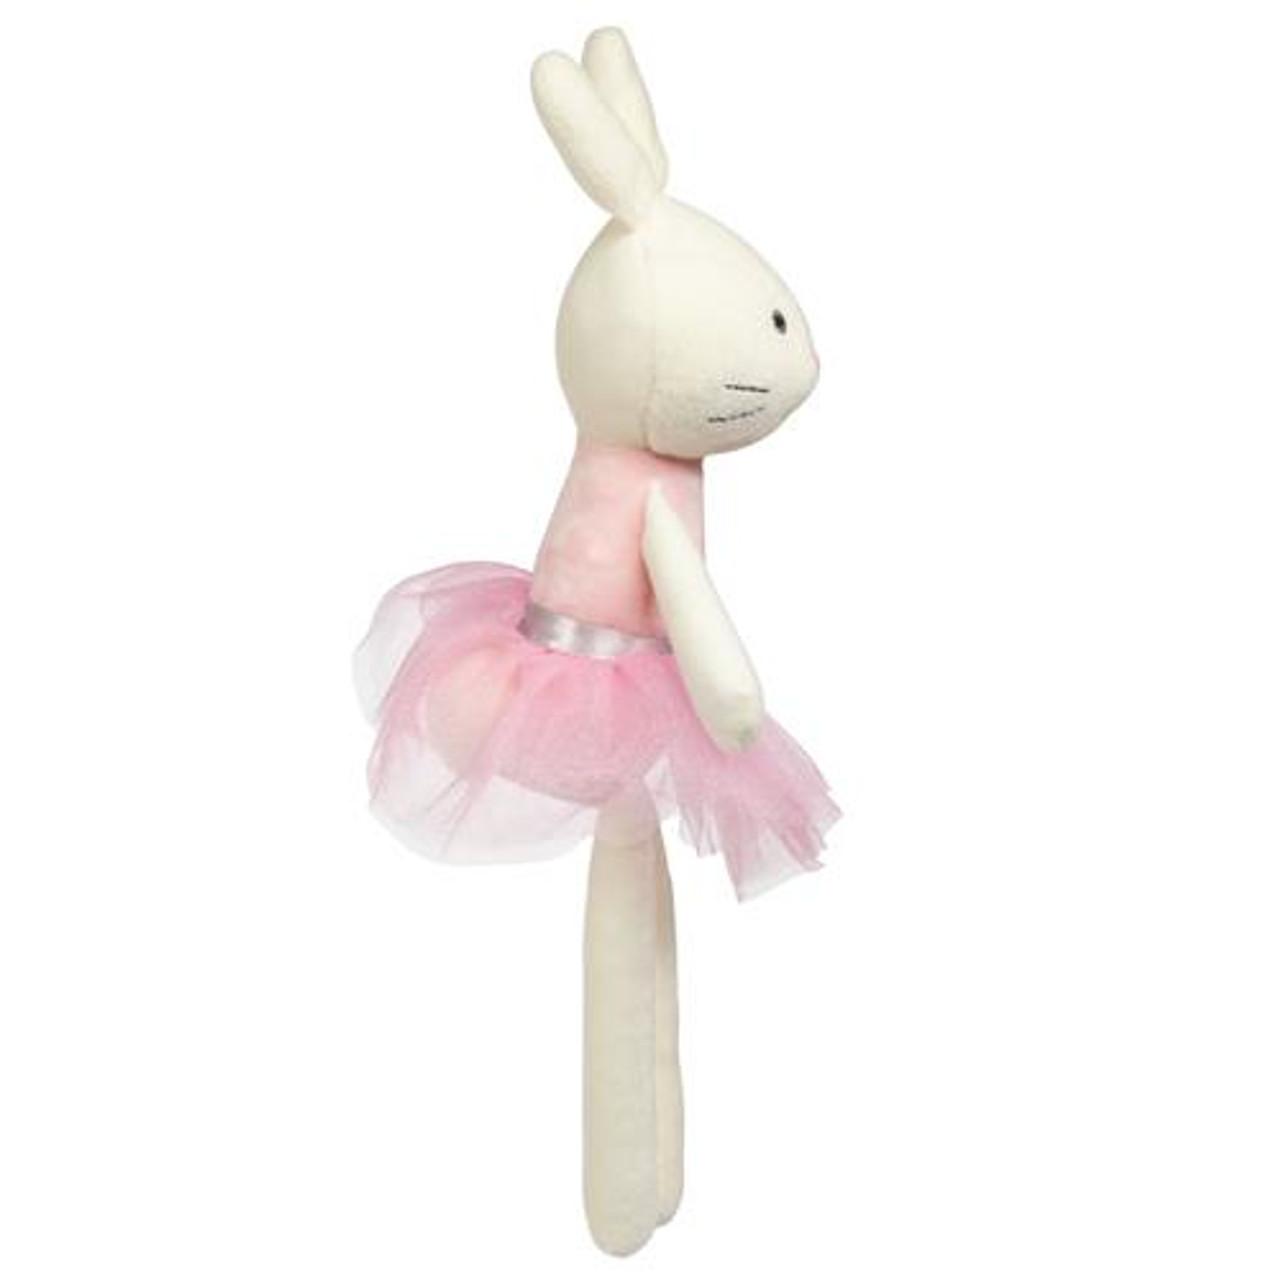 Stephen Joseph Bebe the Bunny plush